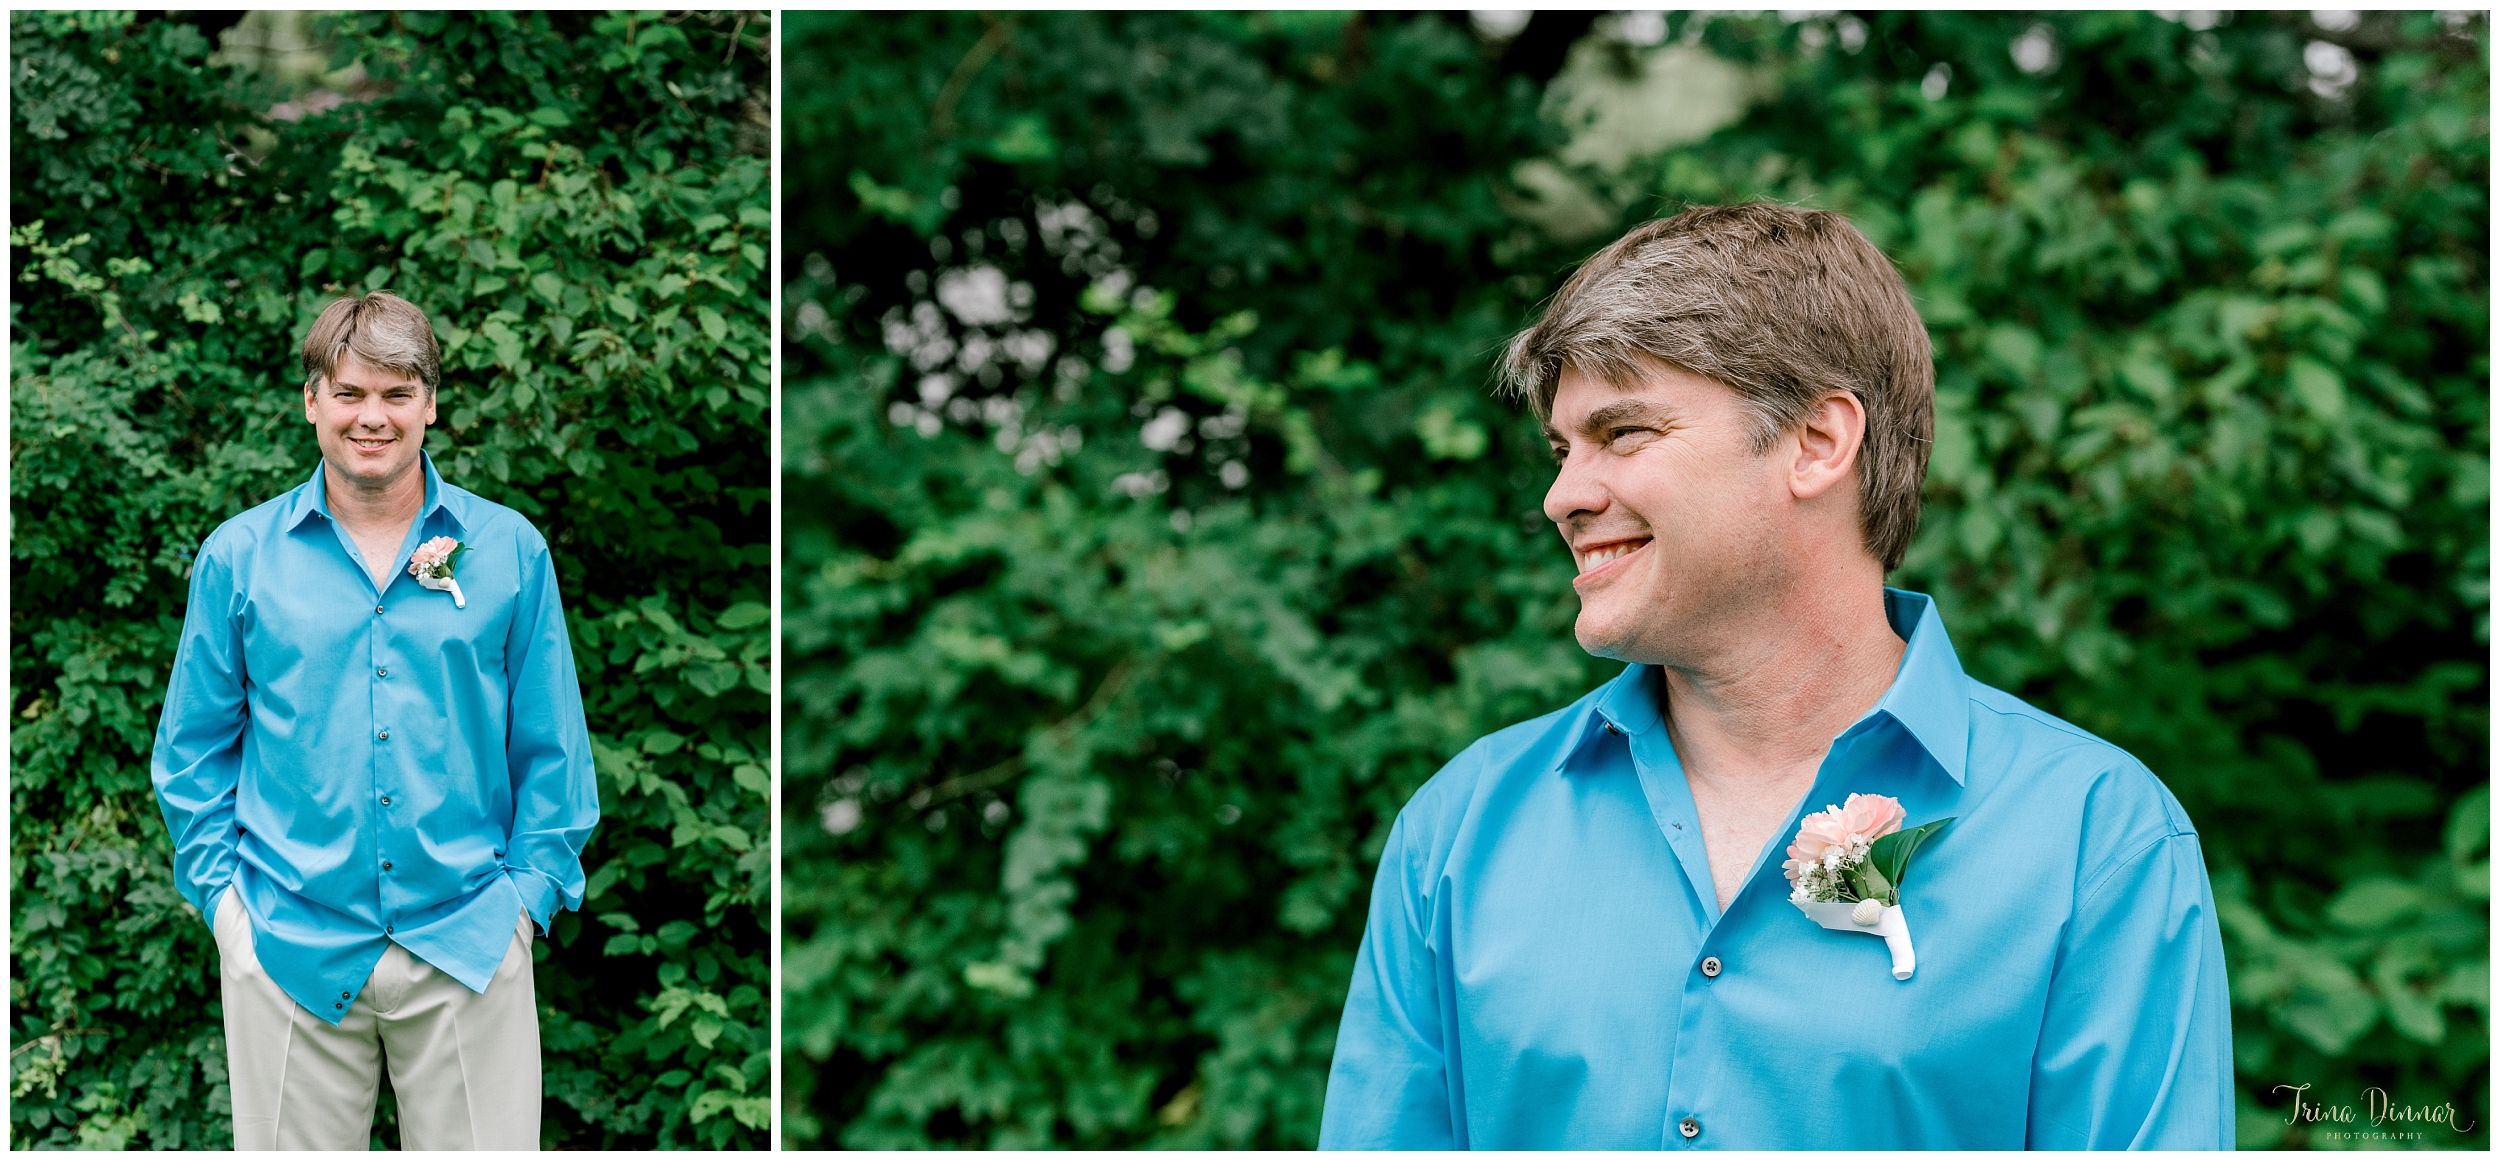 Groom wedding day portraits